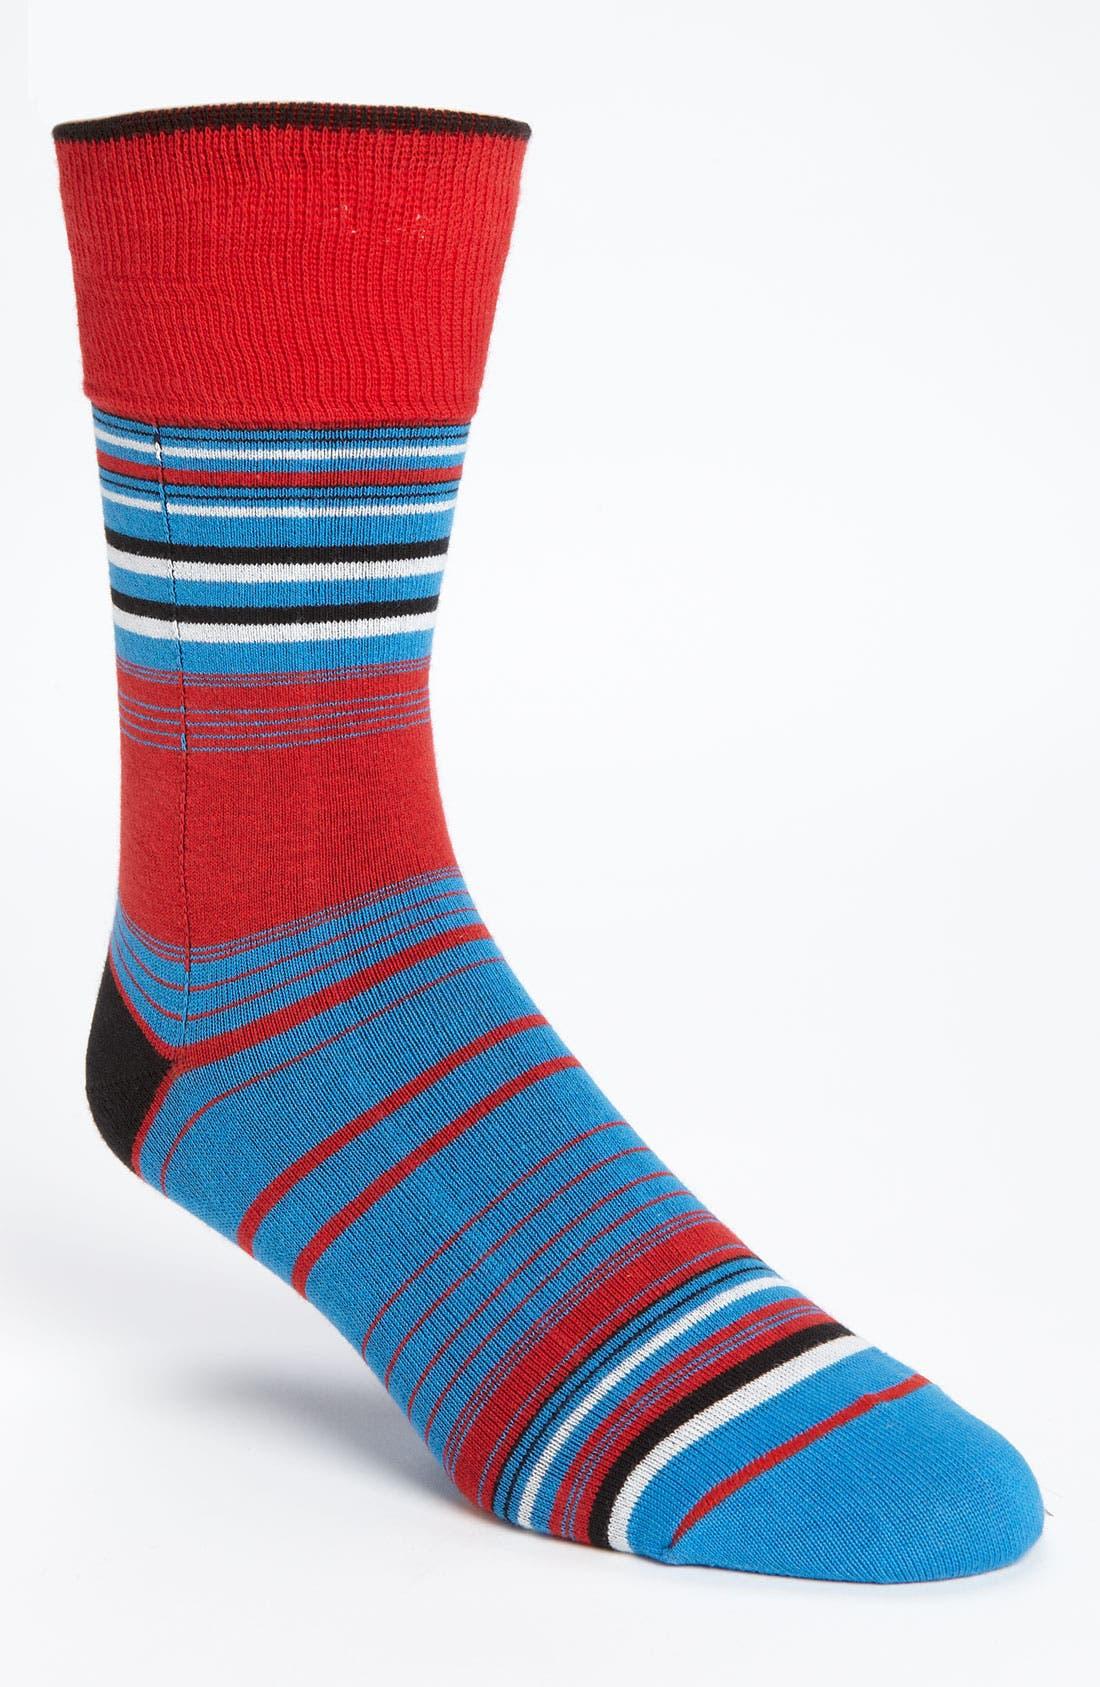 Main Image - ugly vix by V.K. Nagrani 'Roberts' Socks